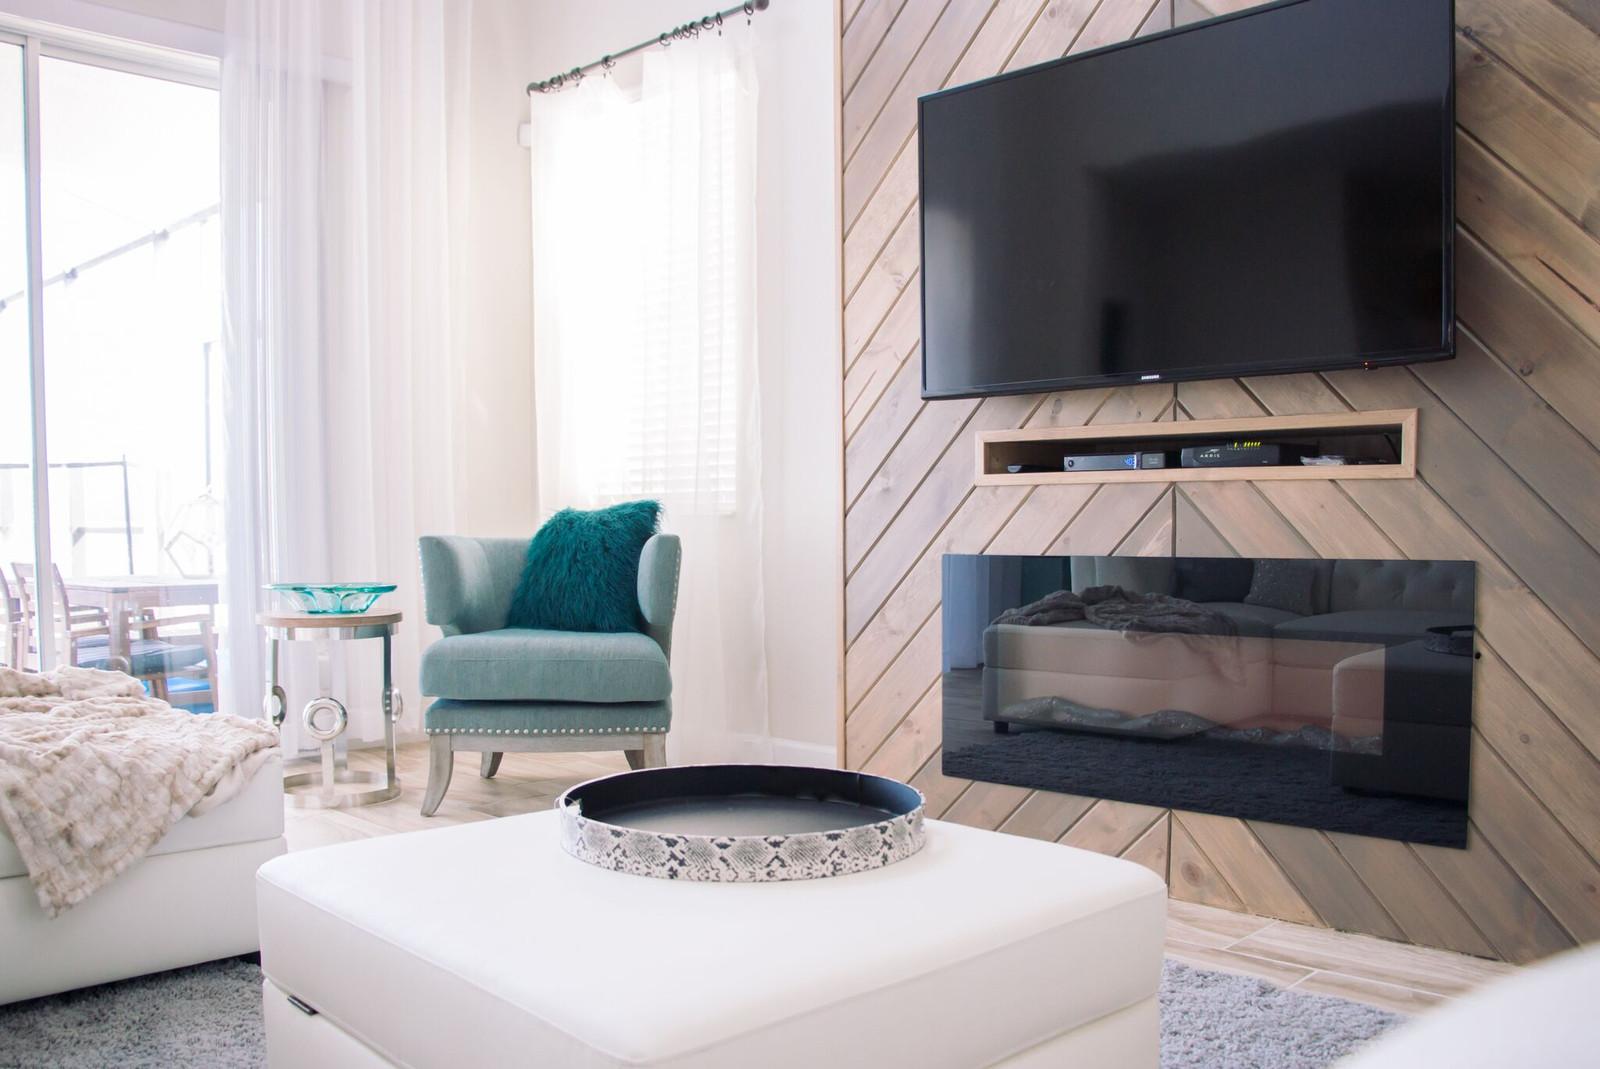 #havehndesign, Affordable Interior Design, Orlando, Affordable Interior  Designer, Havehninteriordesign, Orlando Interior Design, Florida Interior  Design